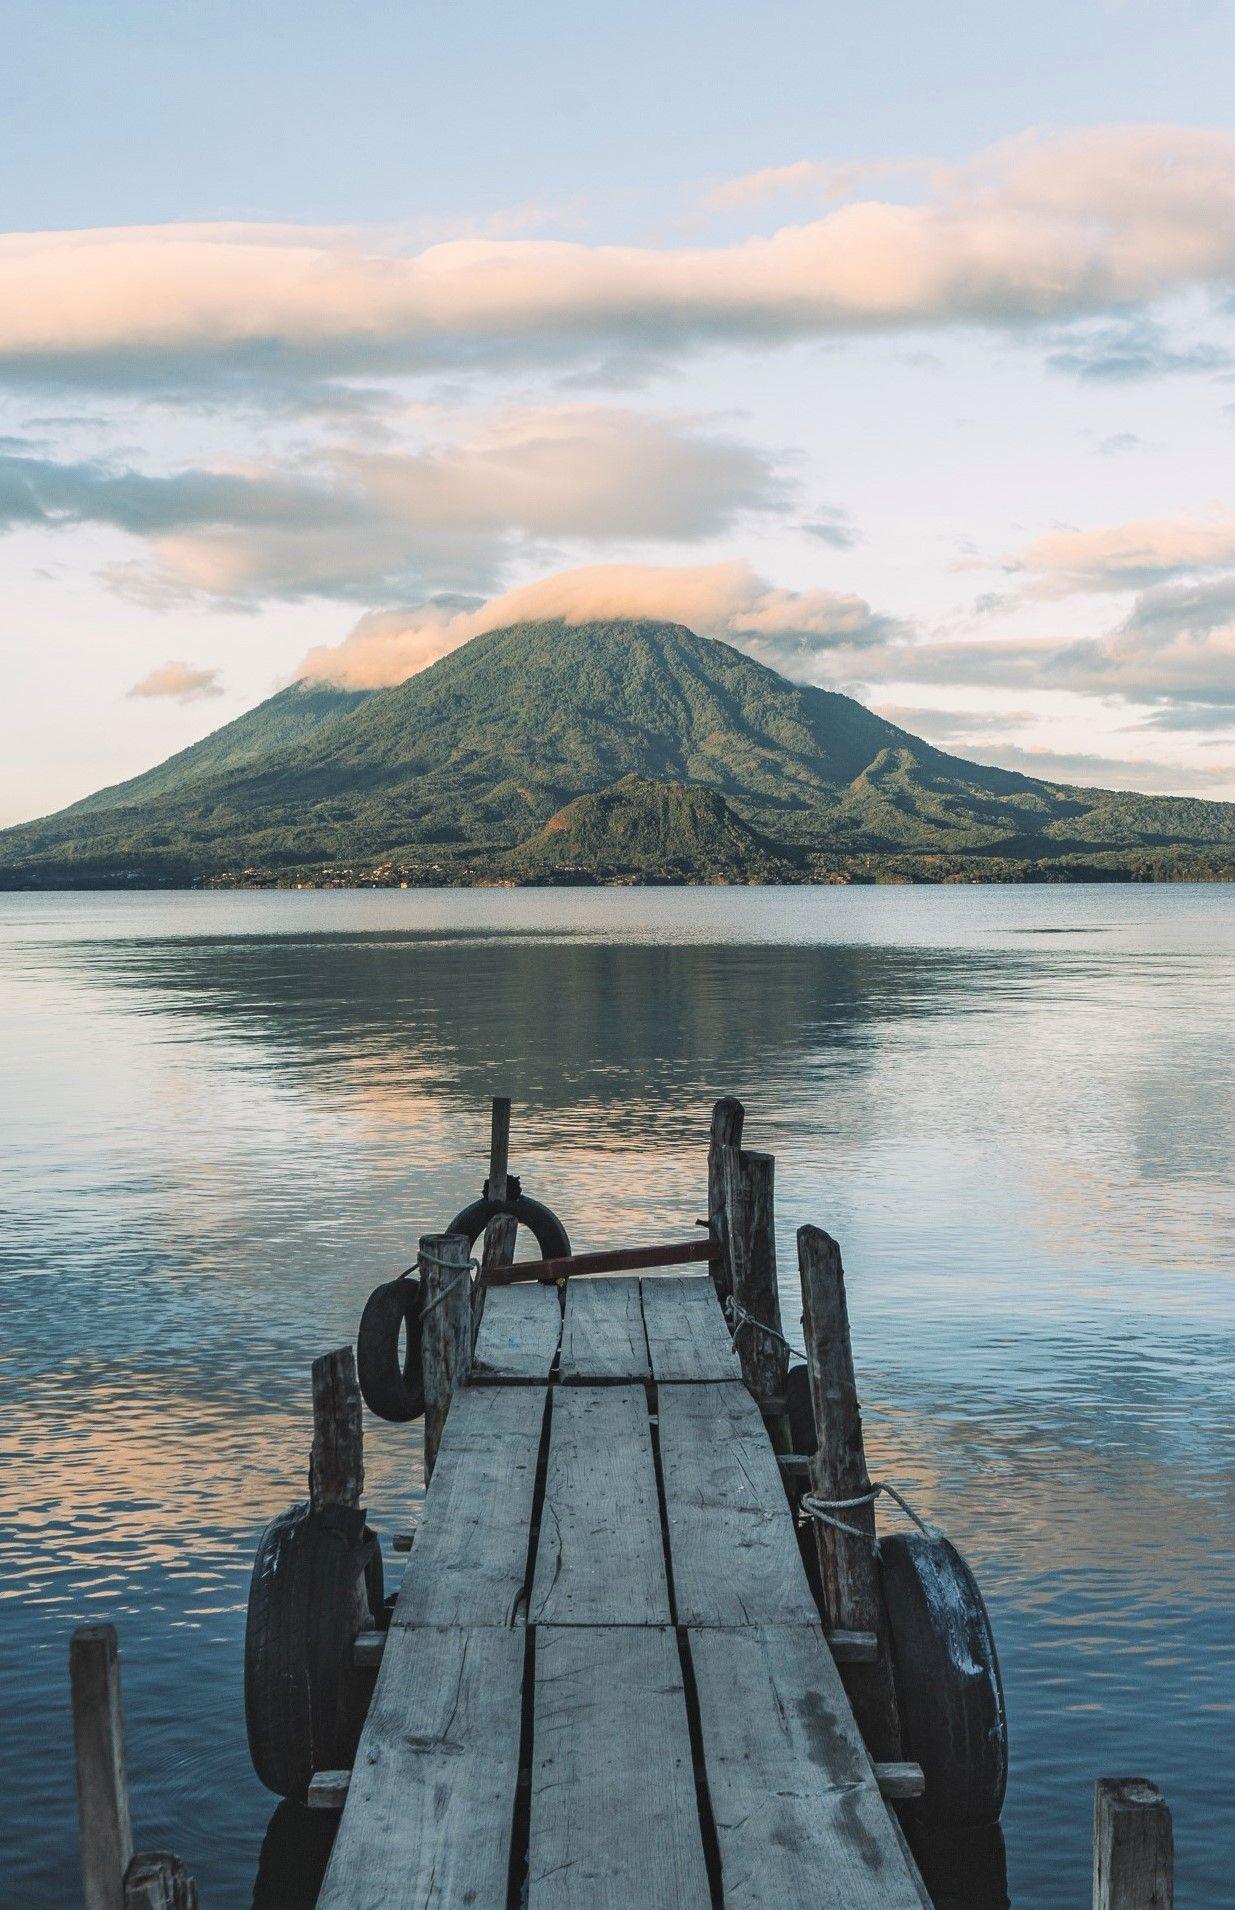 Sunrise from Panajachel town at Lake Atitlan in Guatemala, Central America